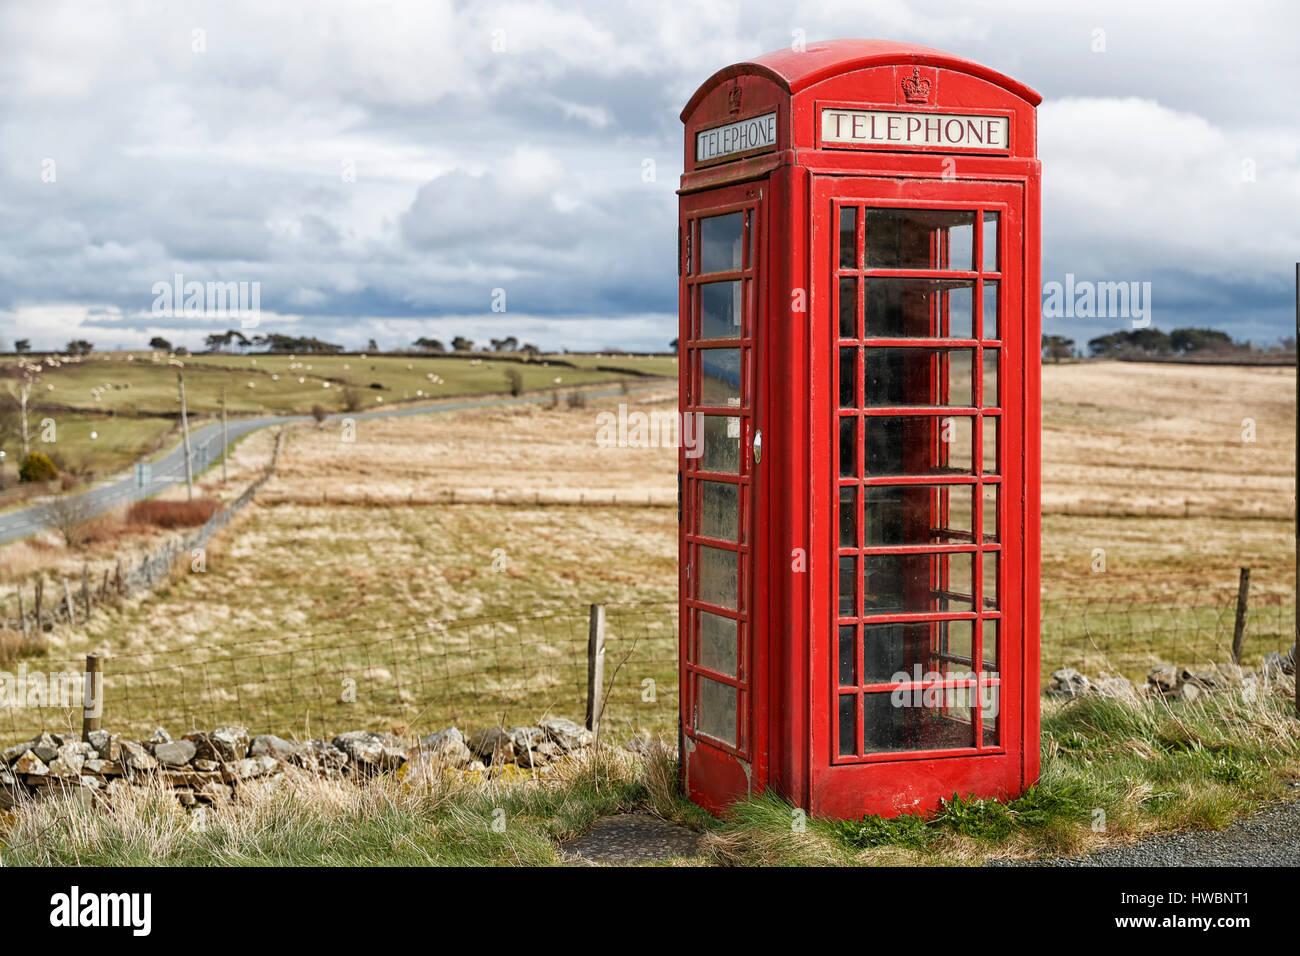 A British Telecom Telephone box, Thruscross. Harrogate, North Yorkshire, UK - Stock Image